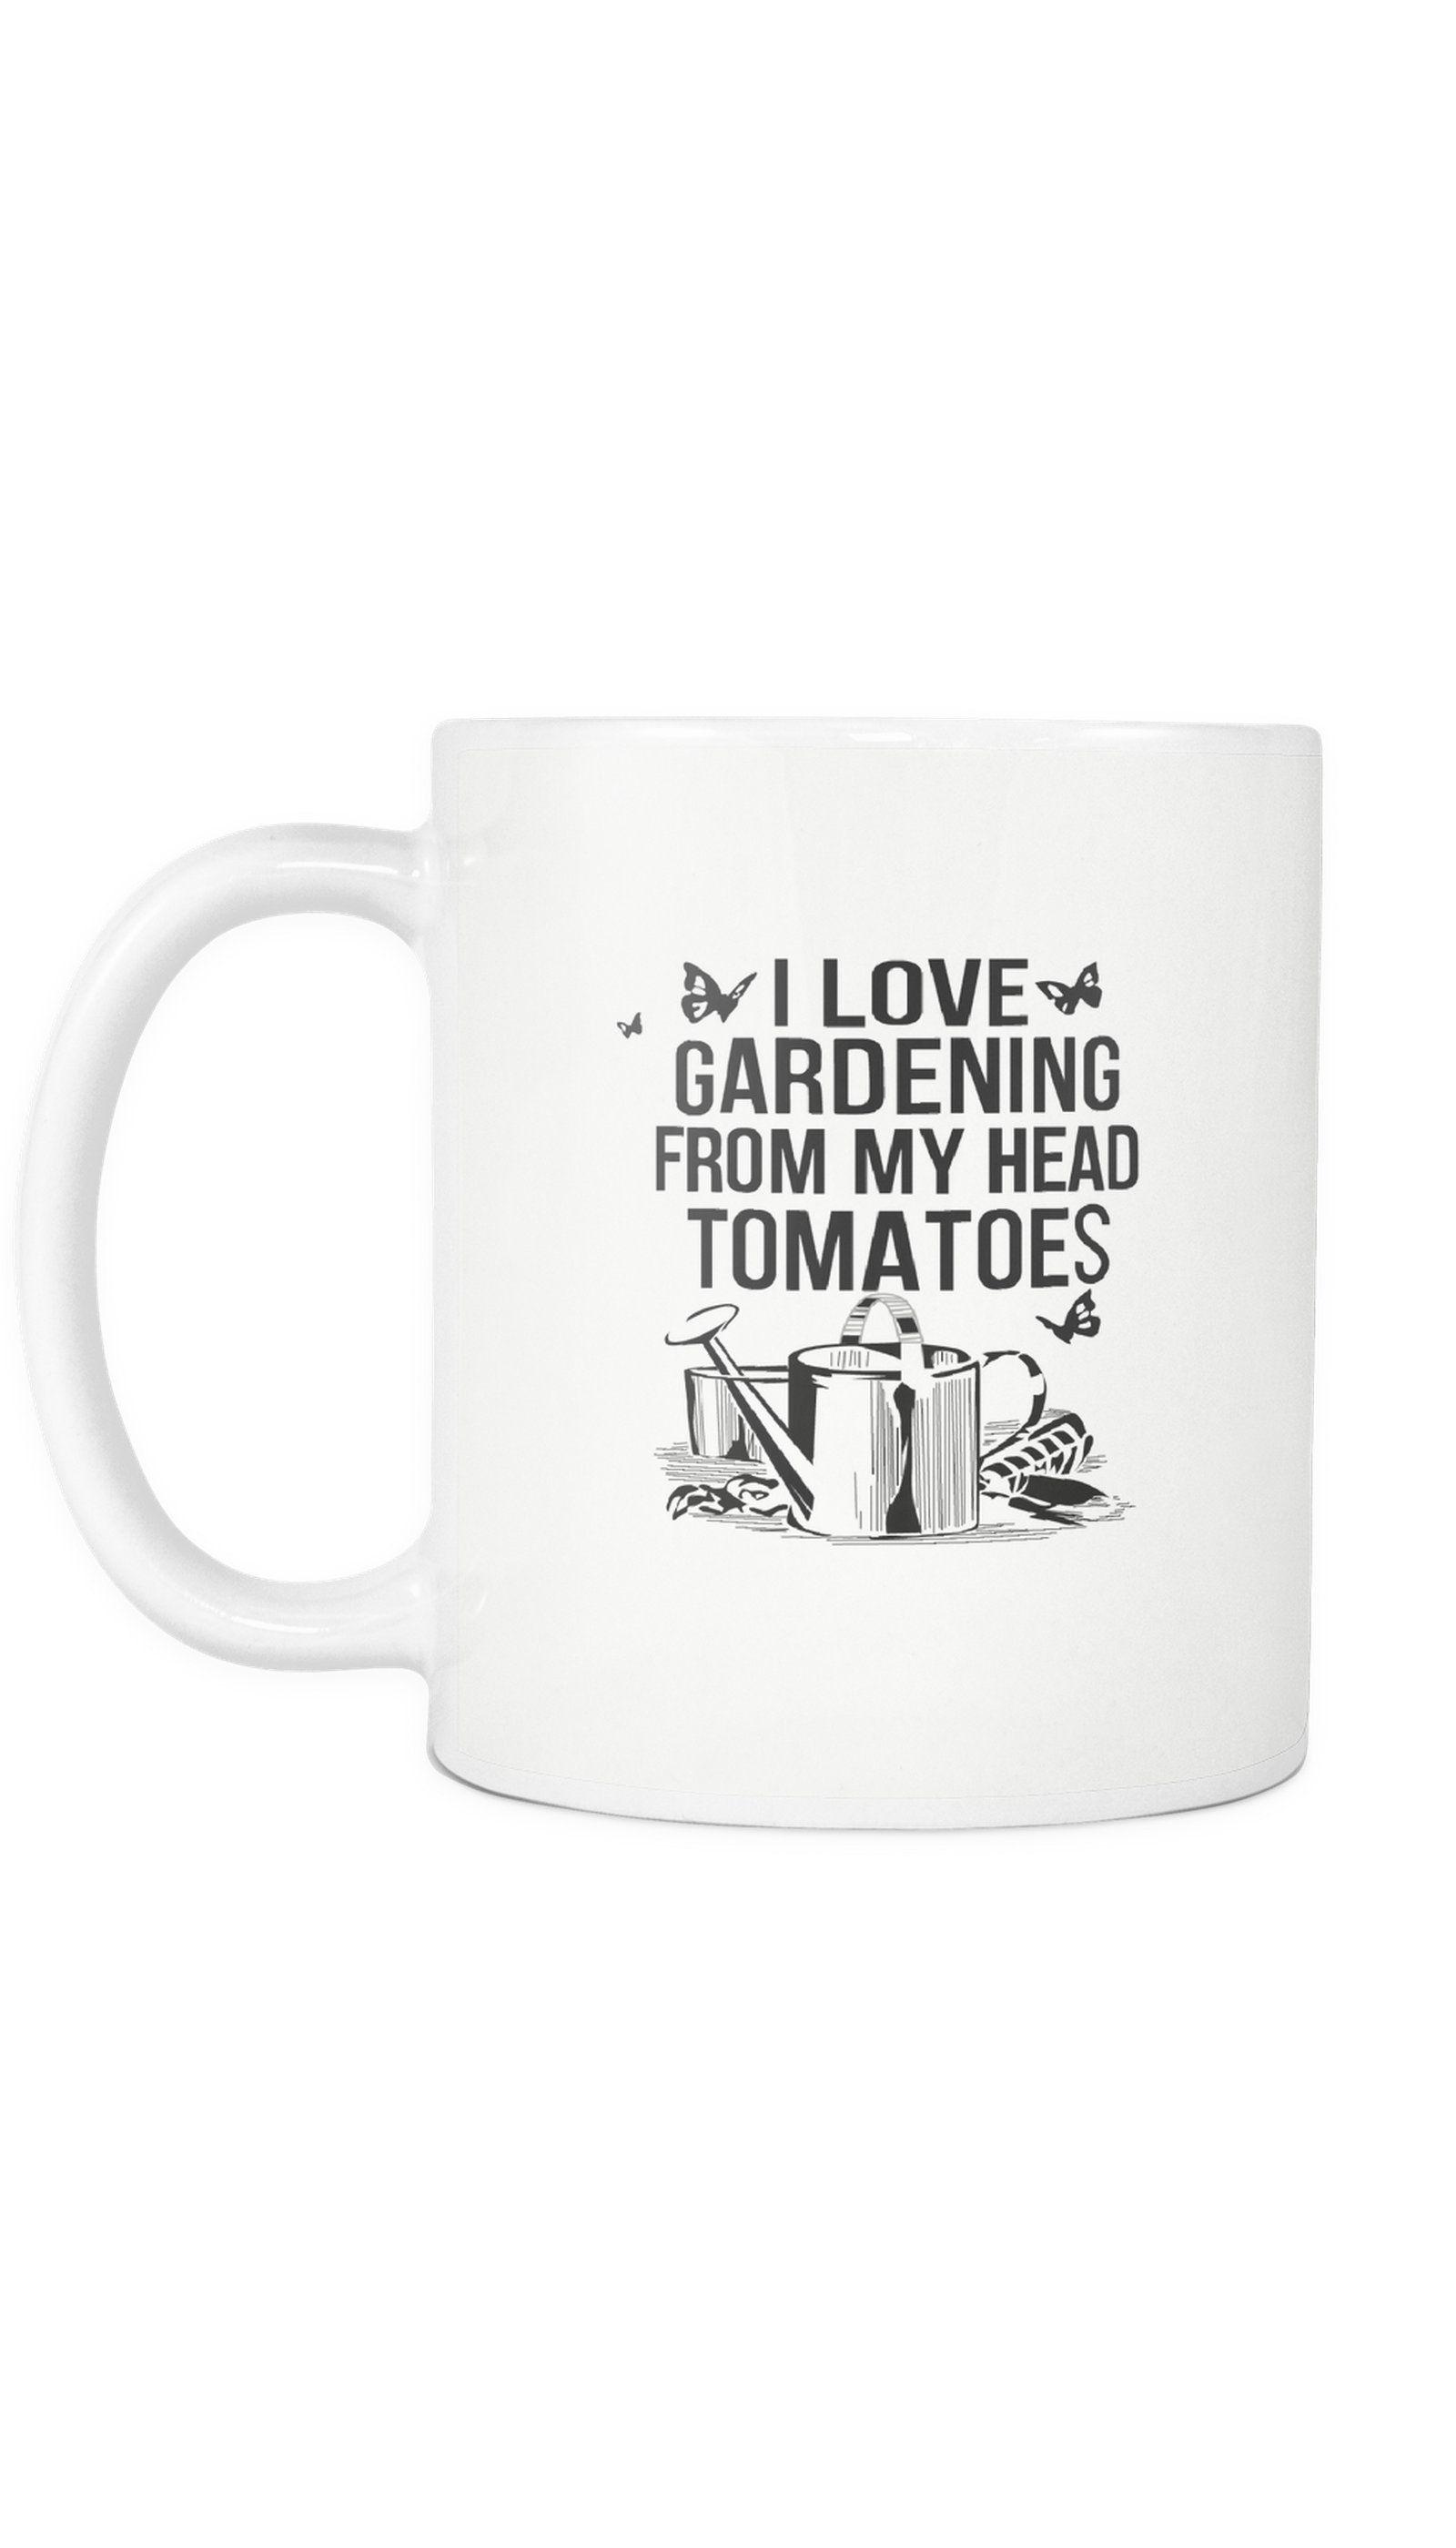 I Love Gardening From My Head Tomatoes Mug Mugs, Funny